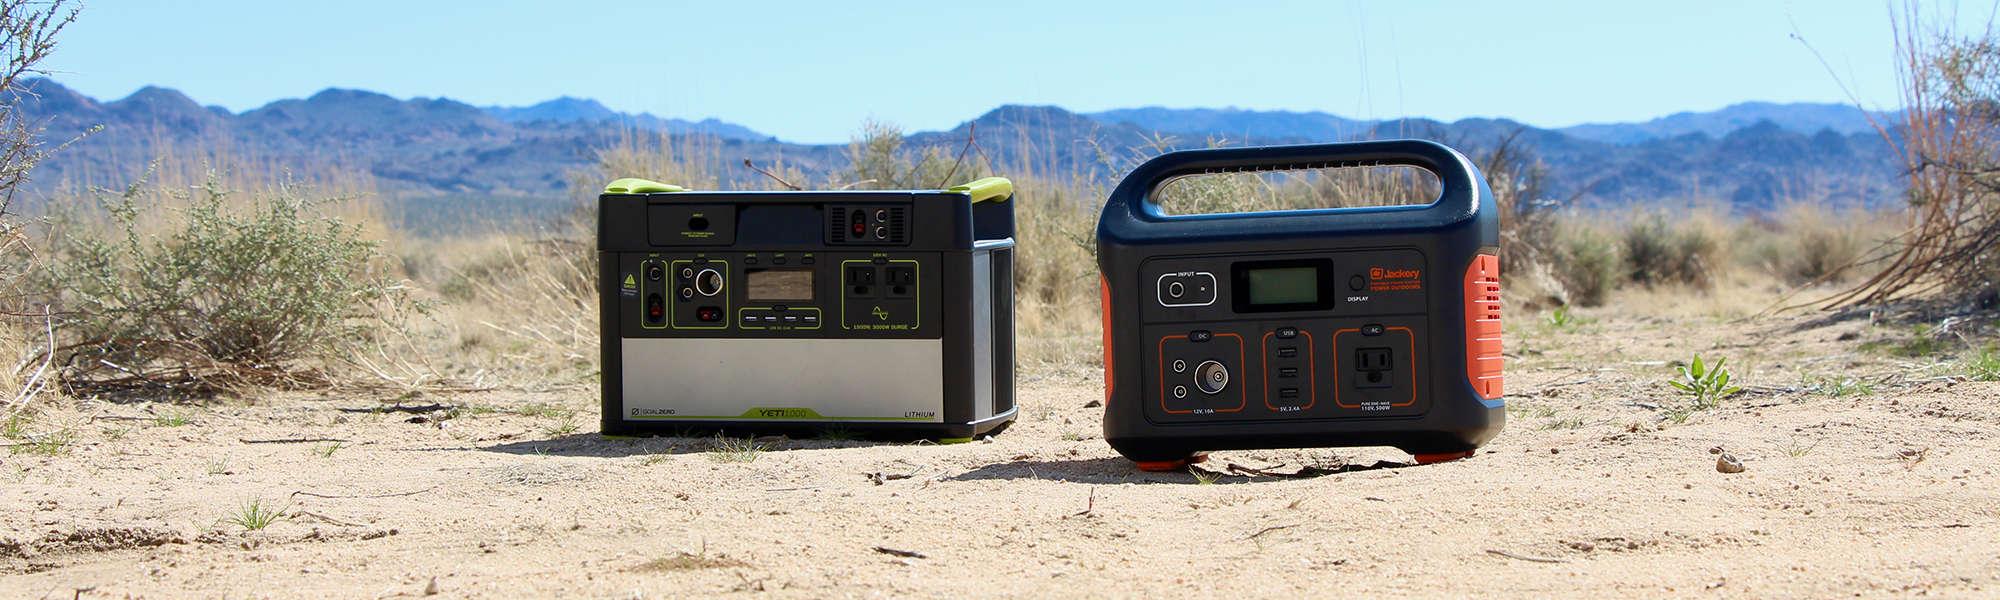 goal-zero-yeti-vs-jackery-explorer-power-stations-solar-generators-the-camping-nerd